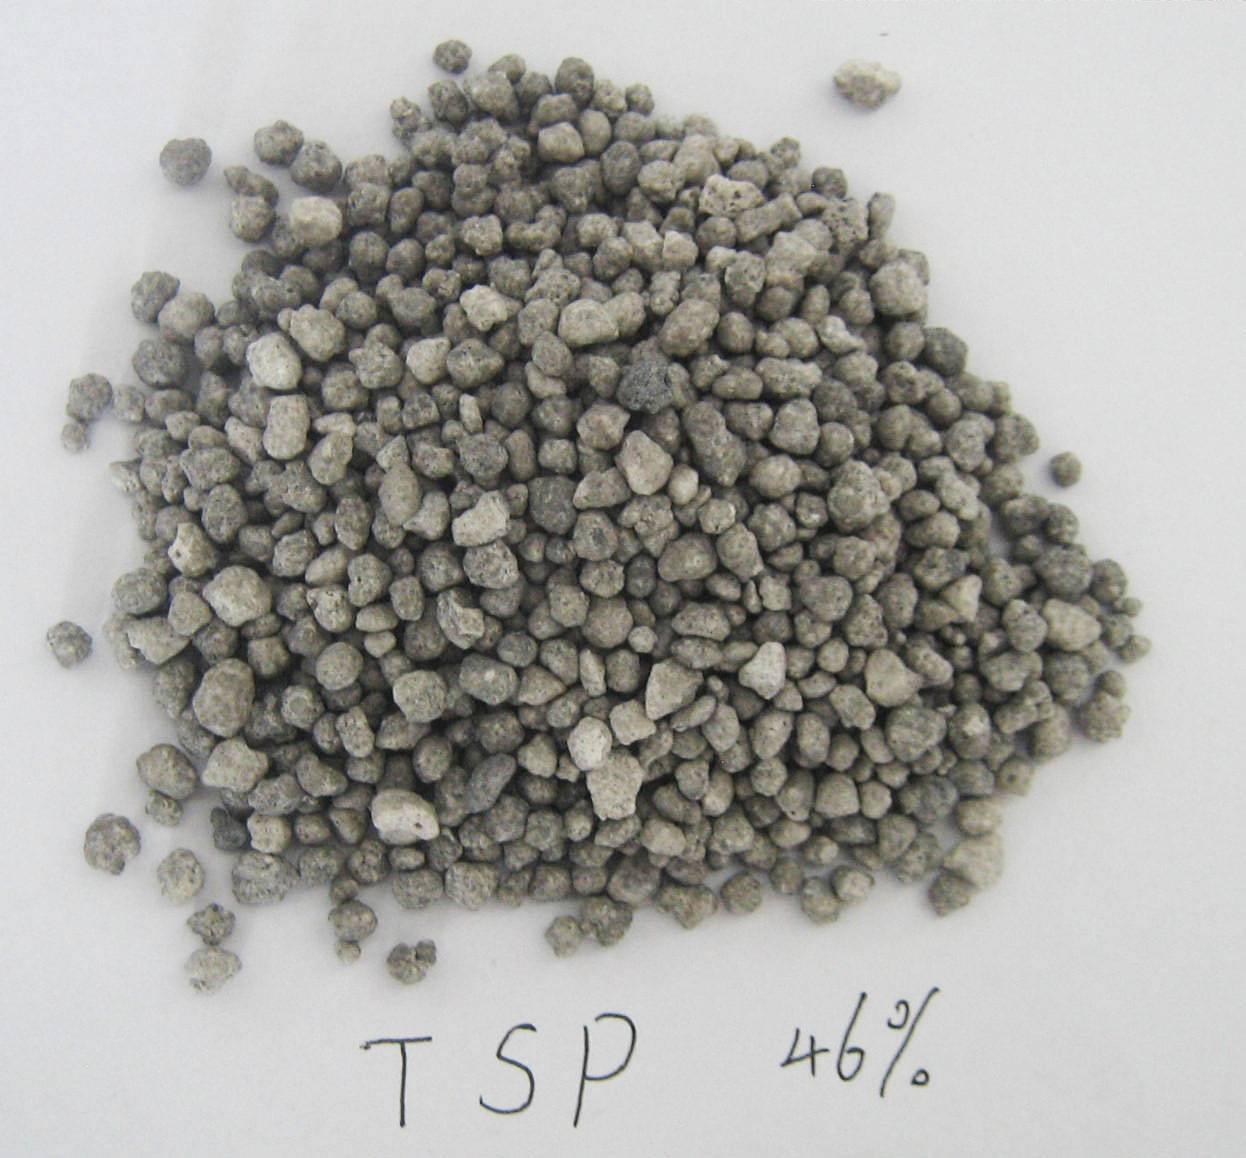 Triple super  phosphate fertilizer